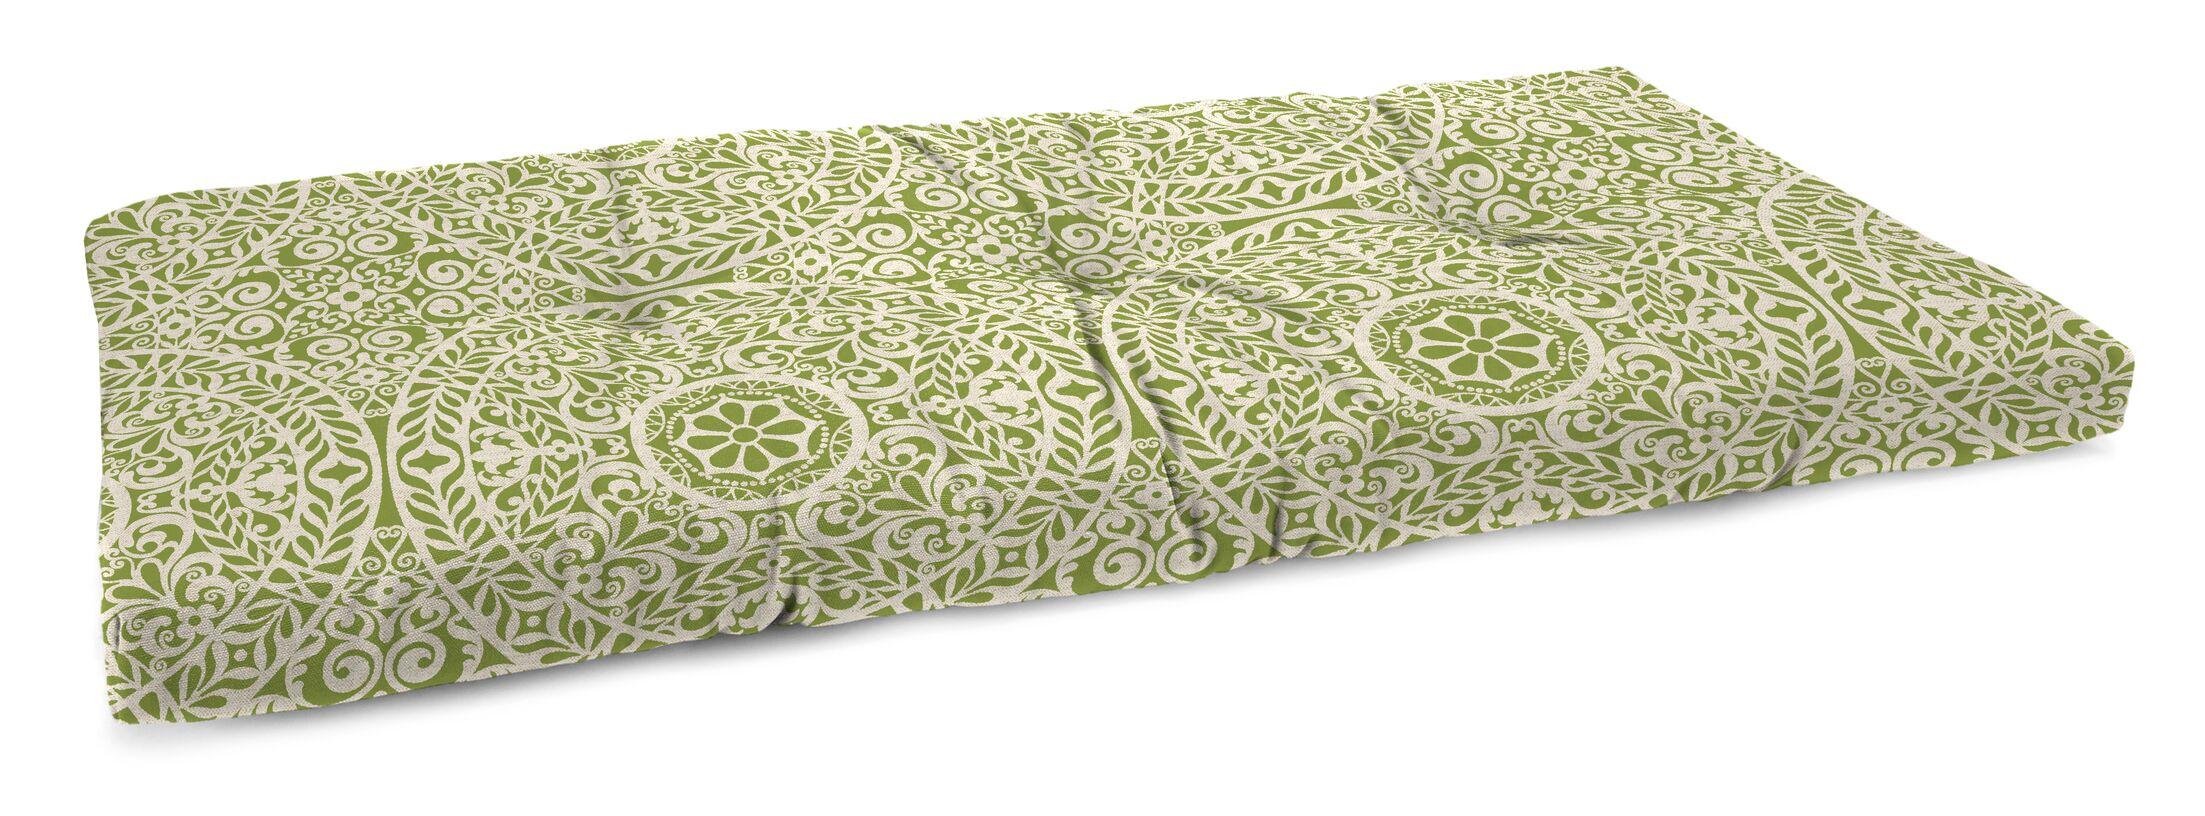 Polyester Indoor Bench Cushion Fabric: Tachenda Palm